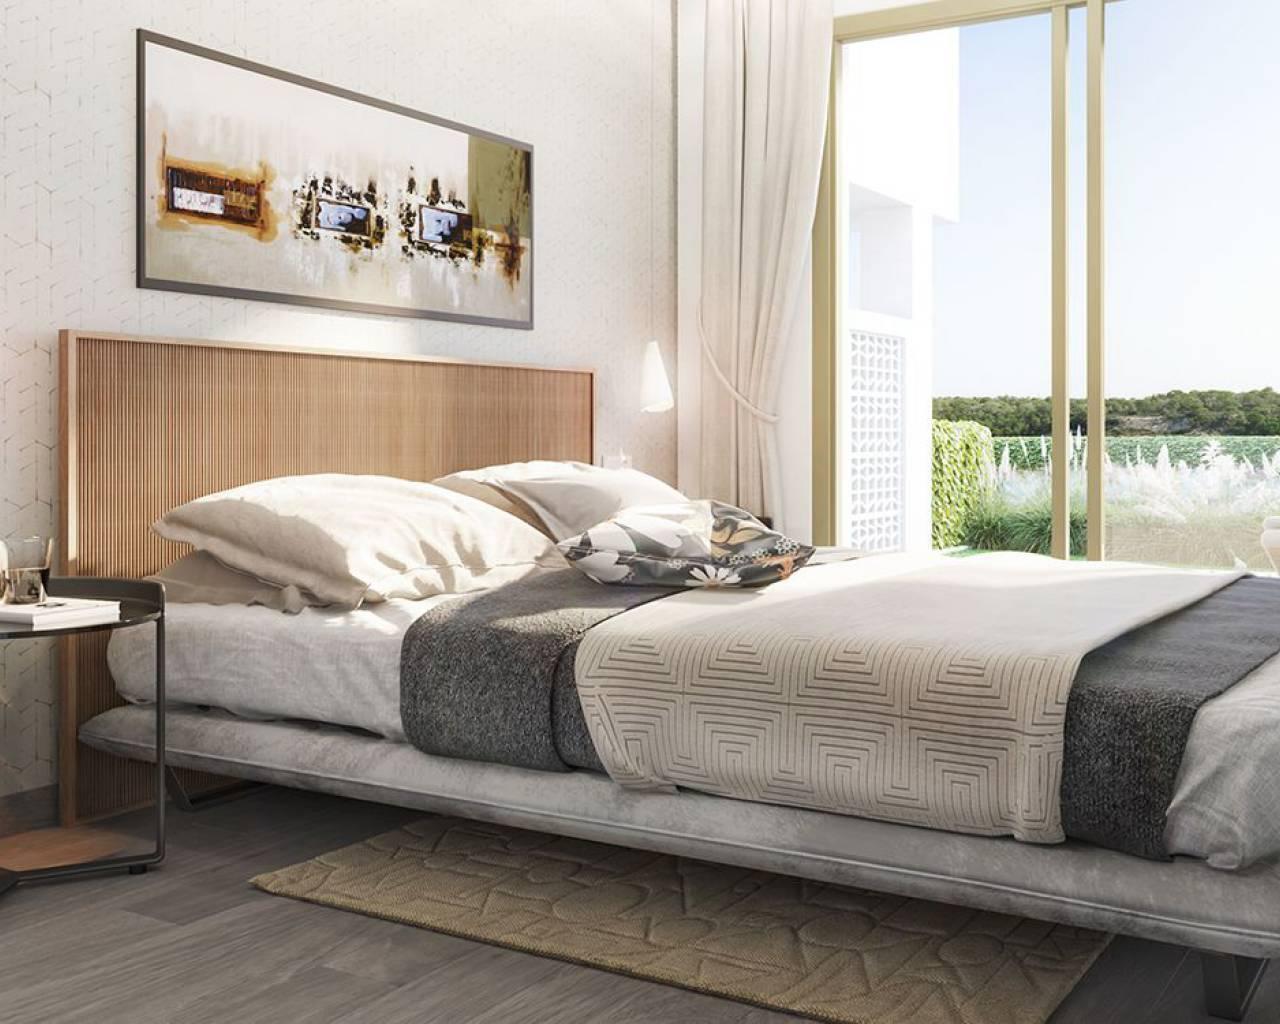 nieuwbouw-appartement-pilar-de-la-horadada_5786_xl